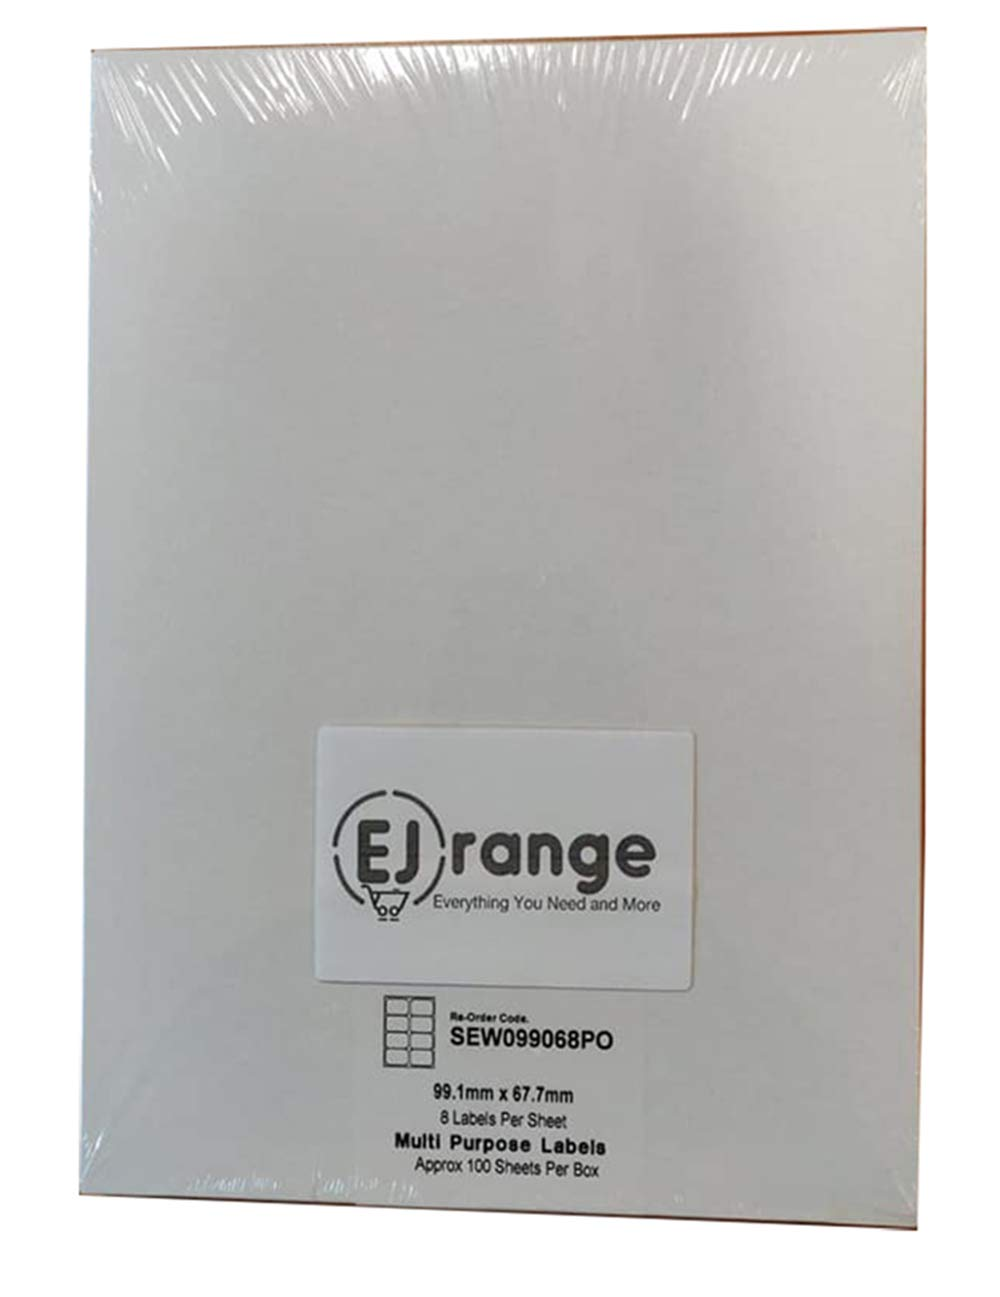 24 Labels, 500 Sheets EJrange Adressetiketten